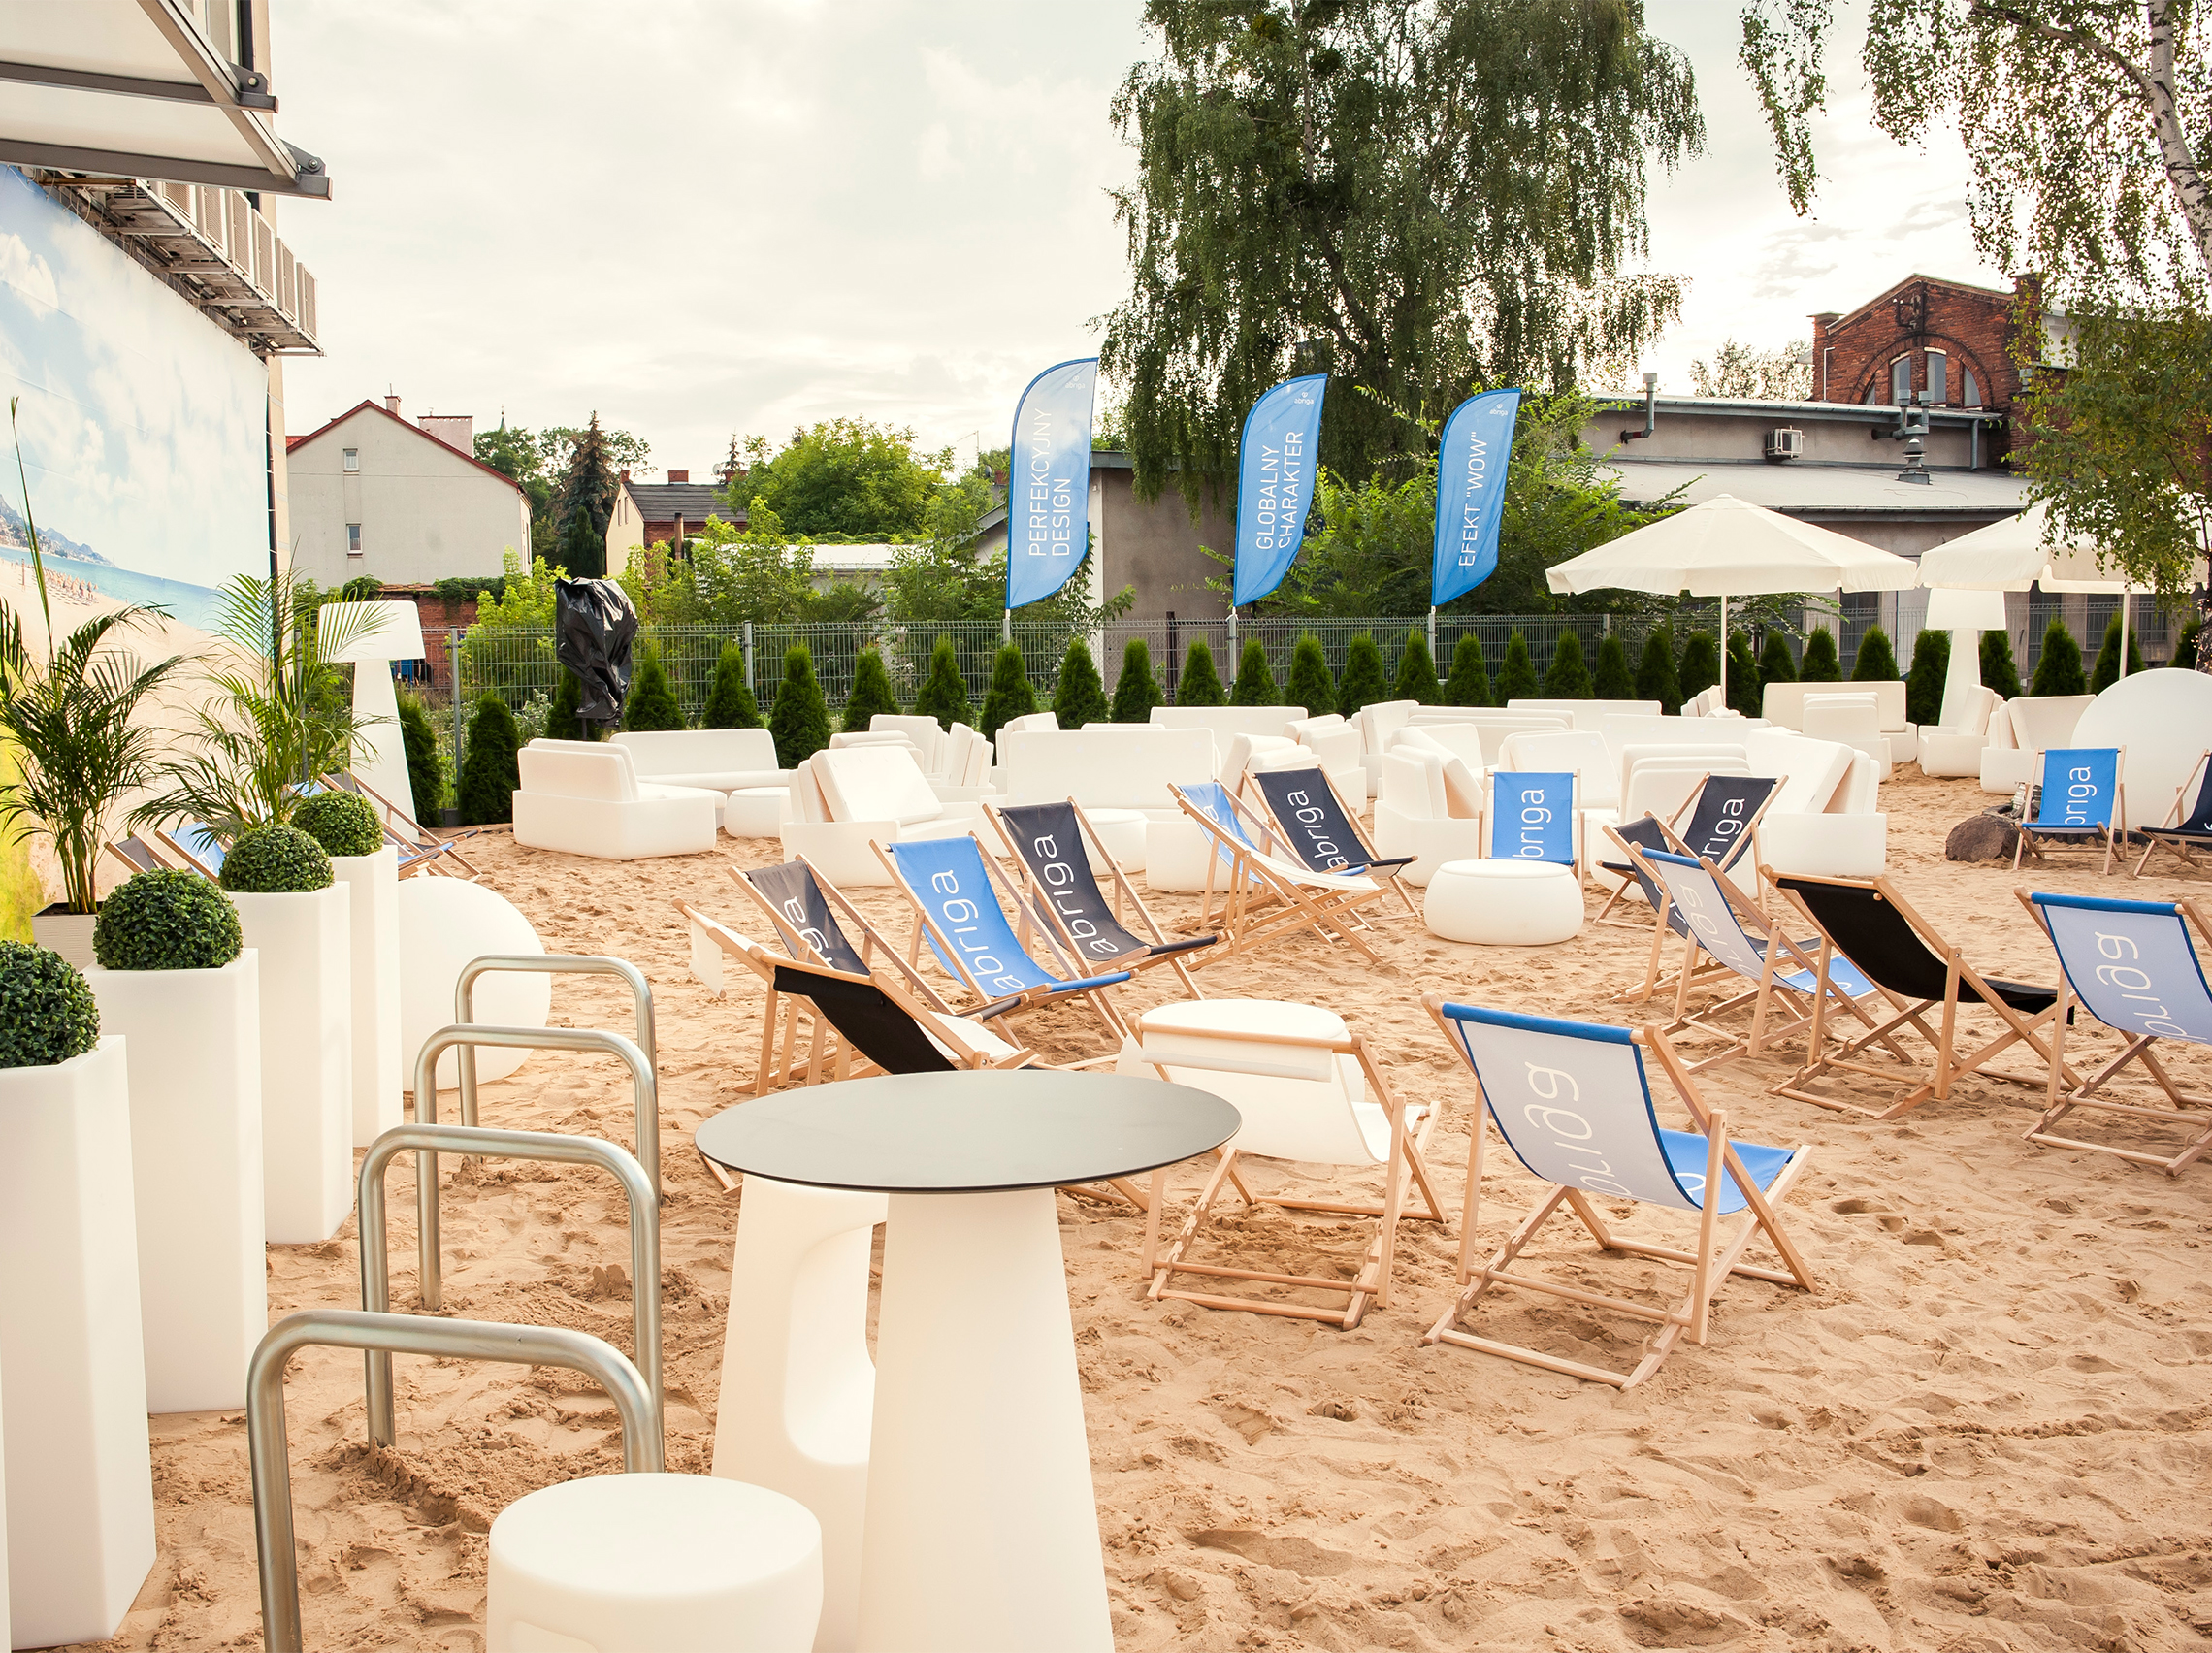 Plaża na Starym Mieście, czyli Abriga Summer Party